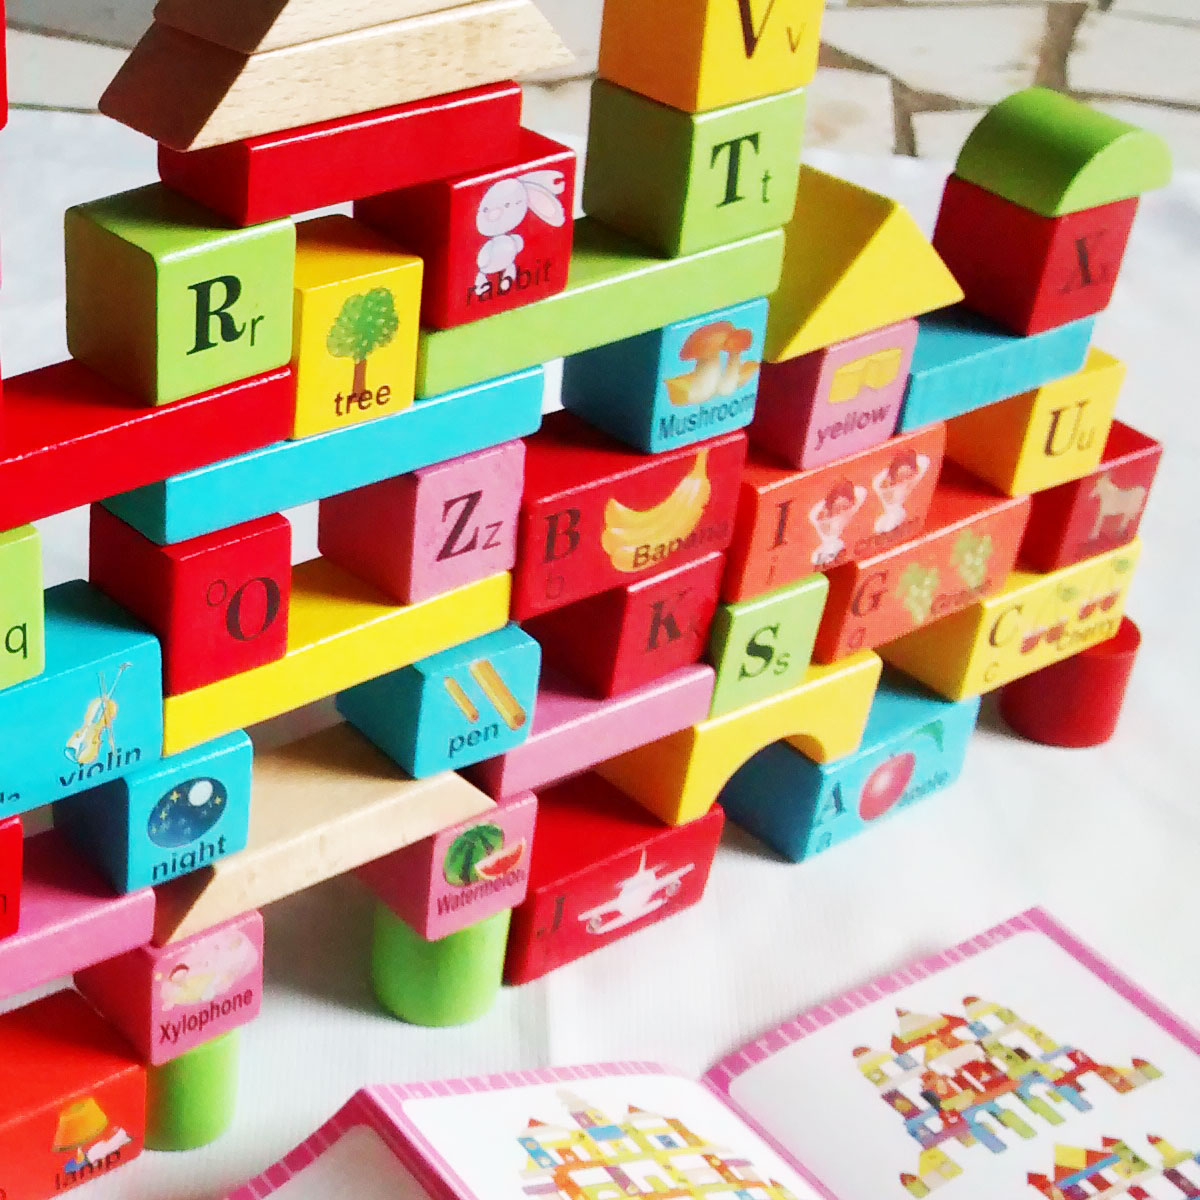 harga Building Blocks 65 Pcs (Balok Susun Kayu) + Ember Sortir + Tas Tokopedia.com